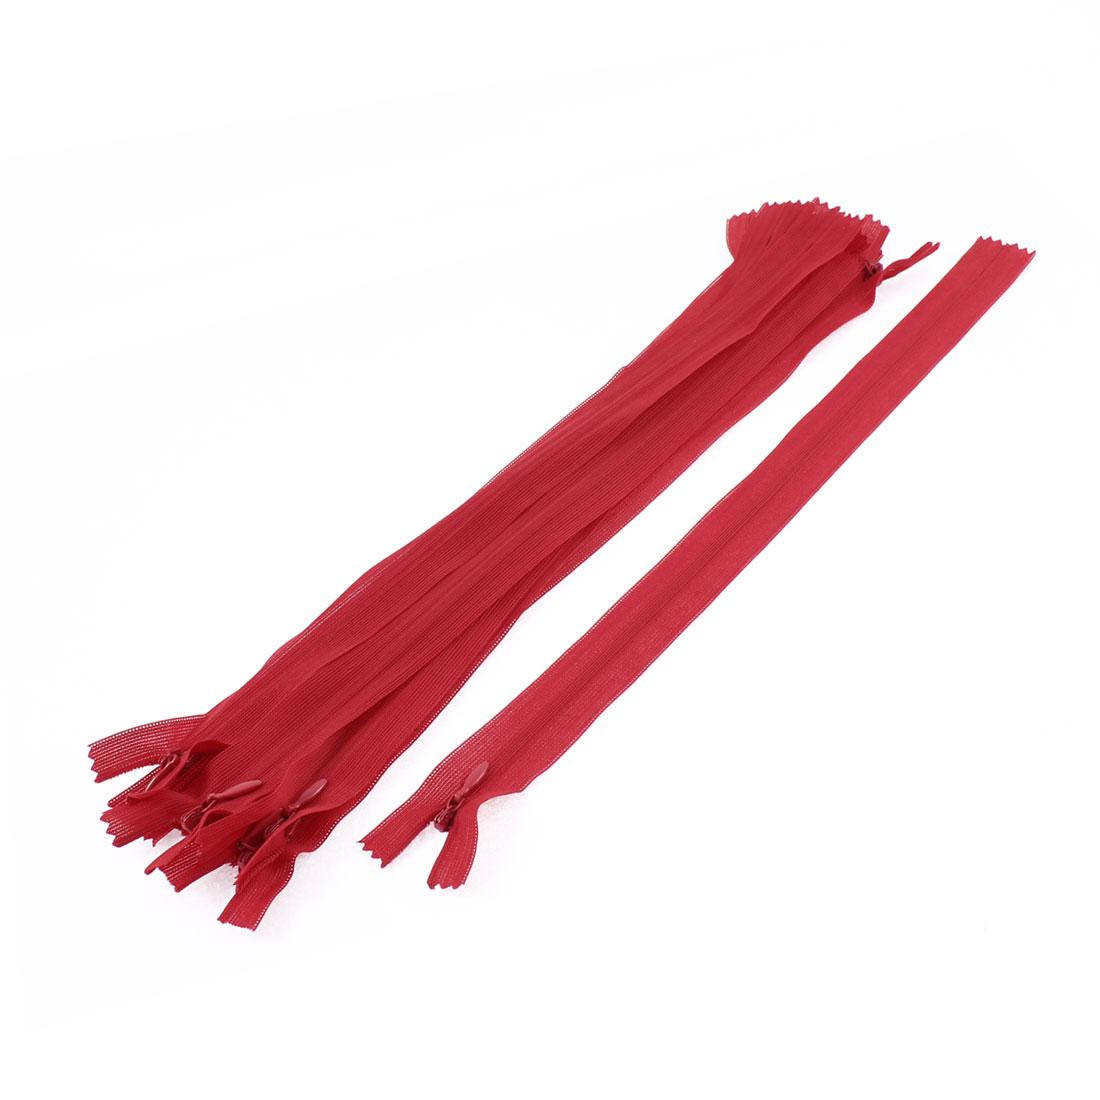 10 Pcs Red 12-inch Long Nylon Zippers Zips for Doll Handbag